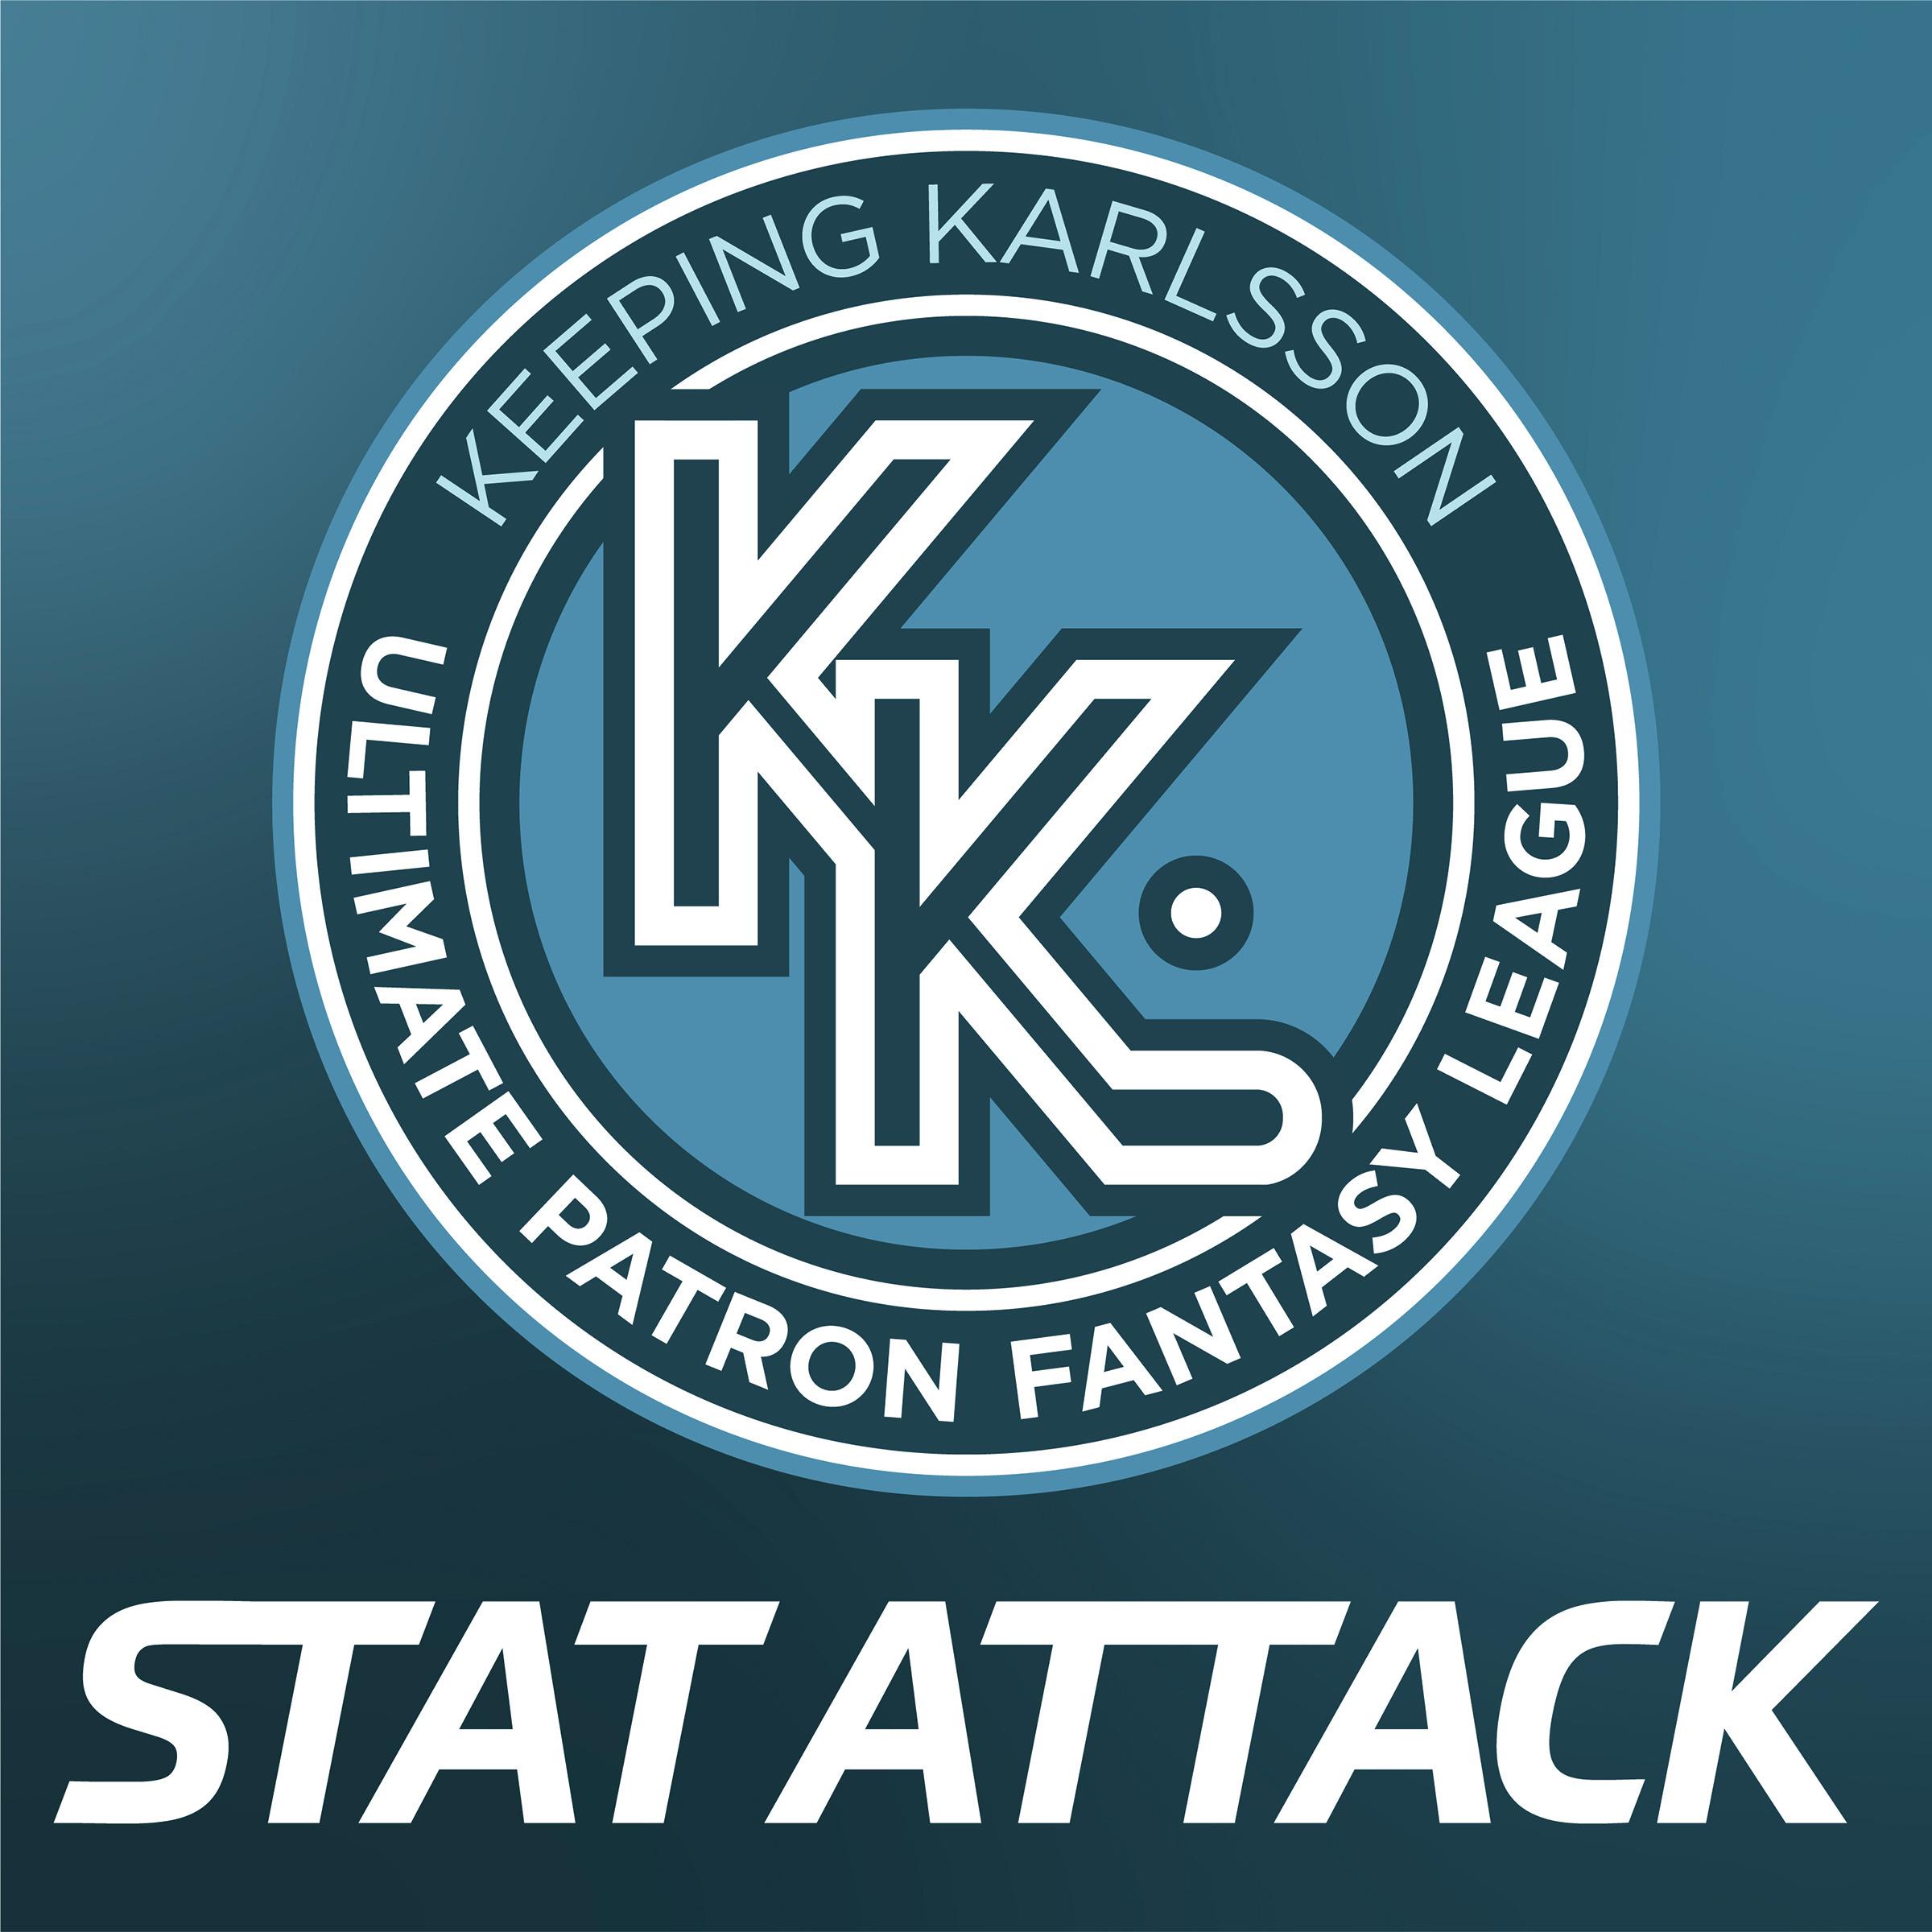 Stat Attack S02E02 - Julien Paquette